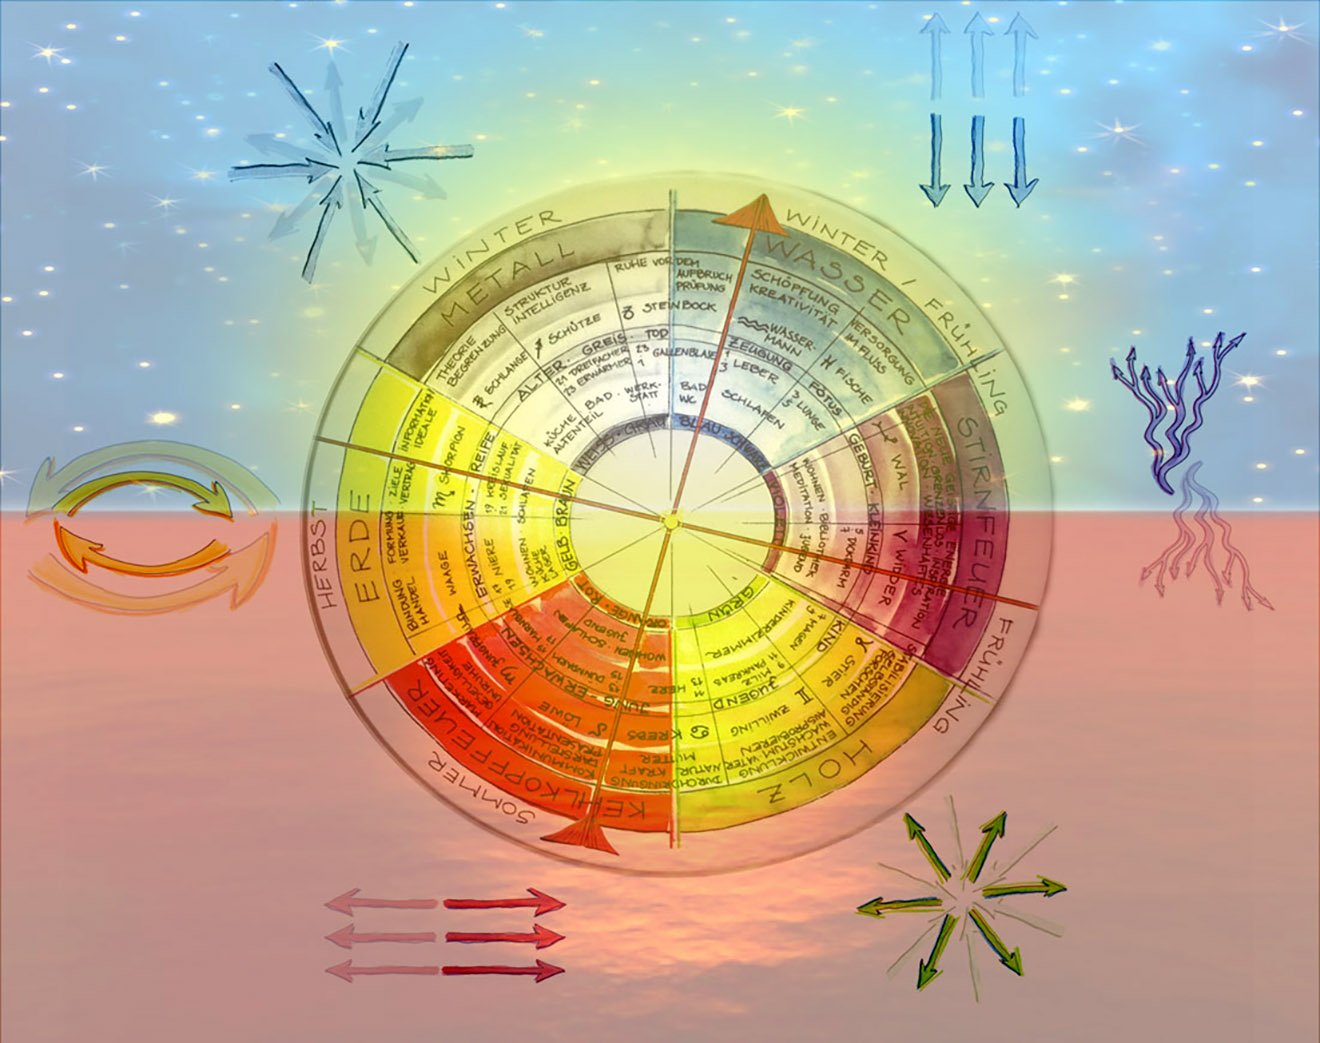 Elemente-Kreis-Farben